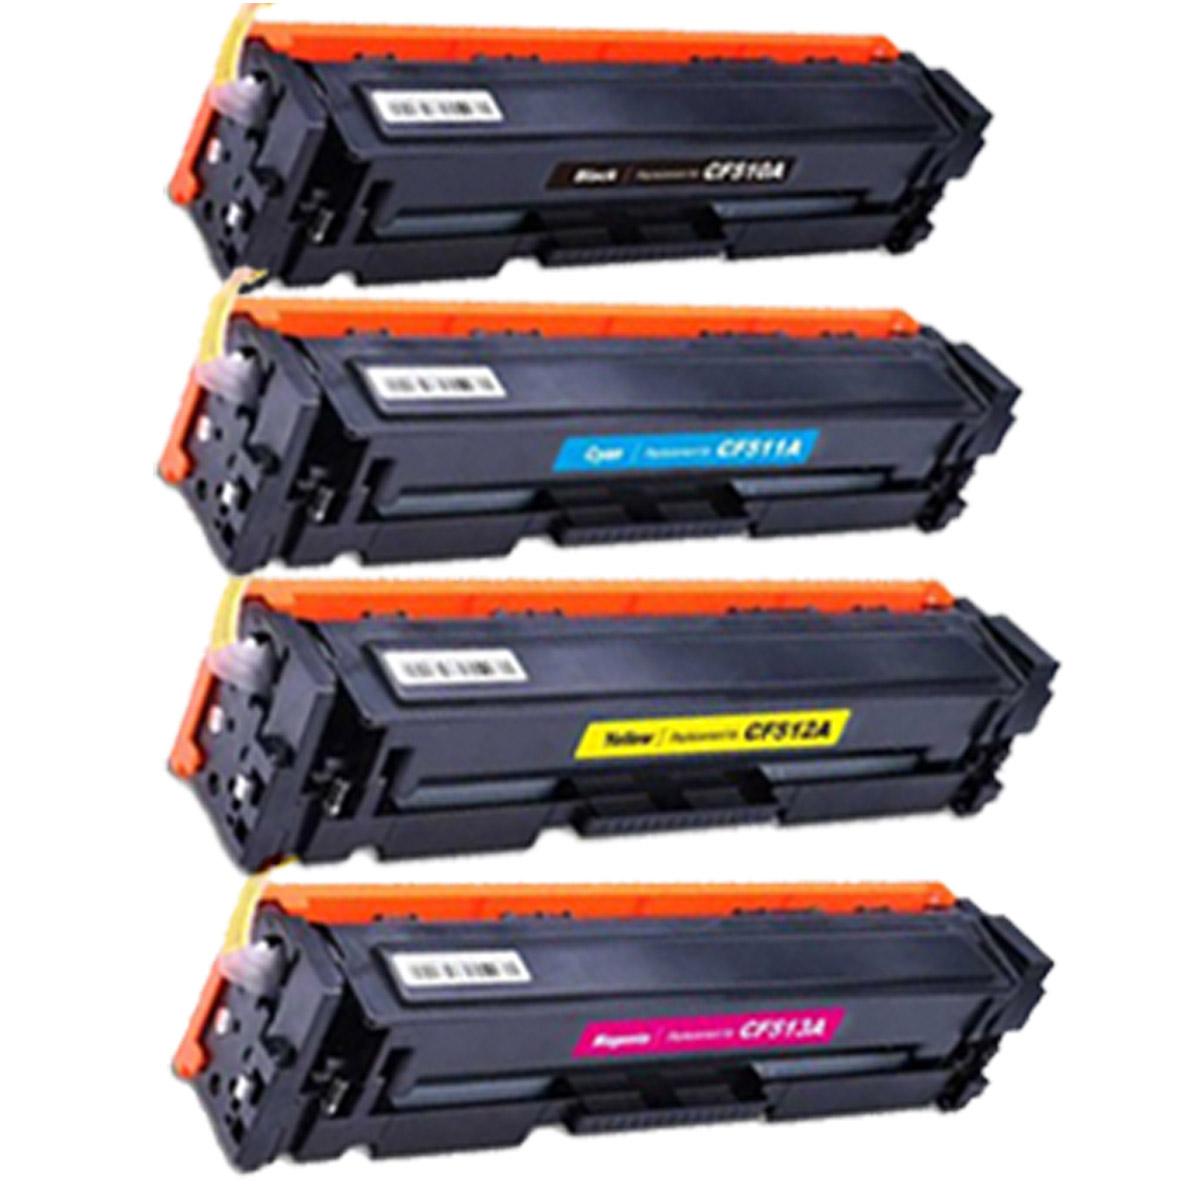 Kit 4 Toner CF510A CF511A CF512 CF513 204A - M180NW M180